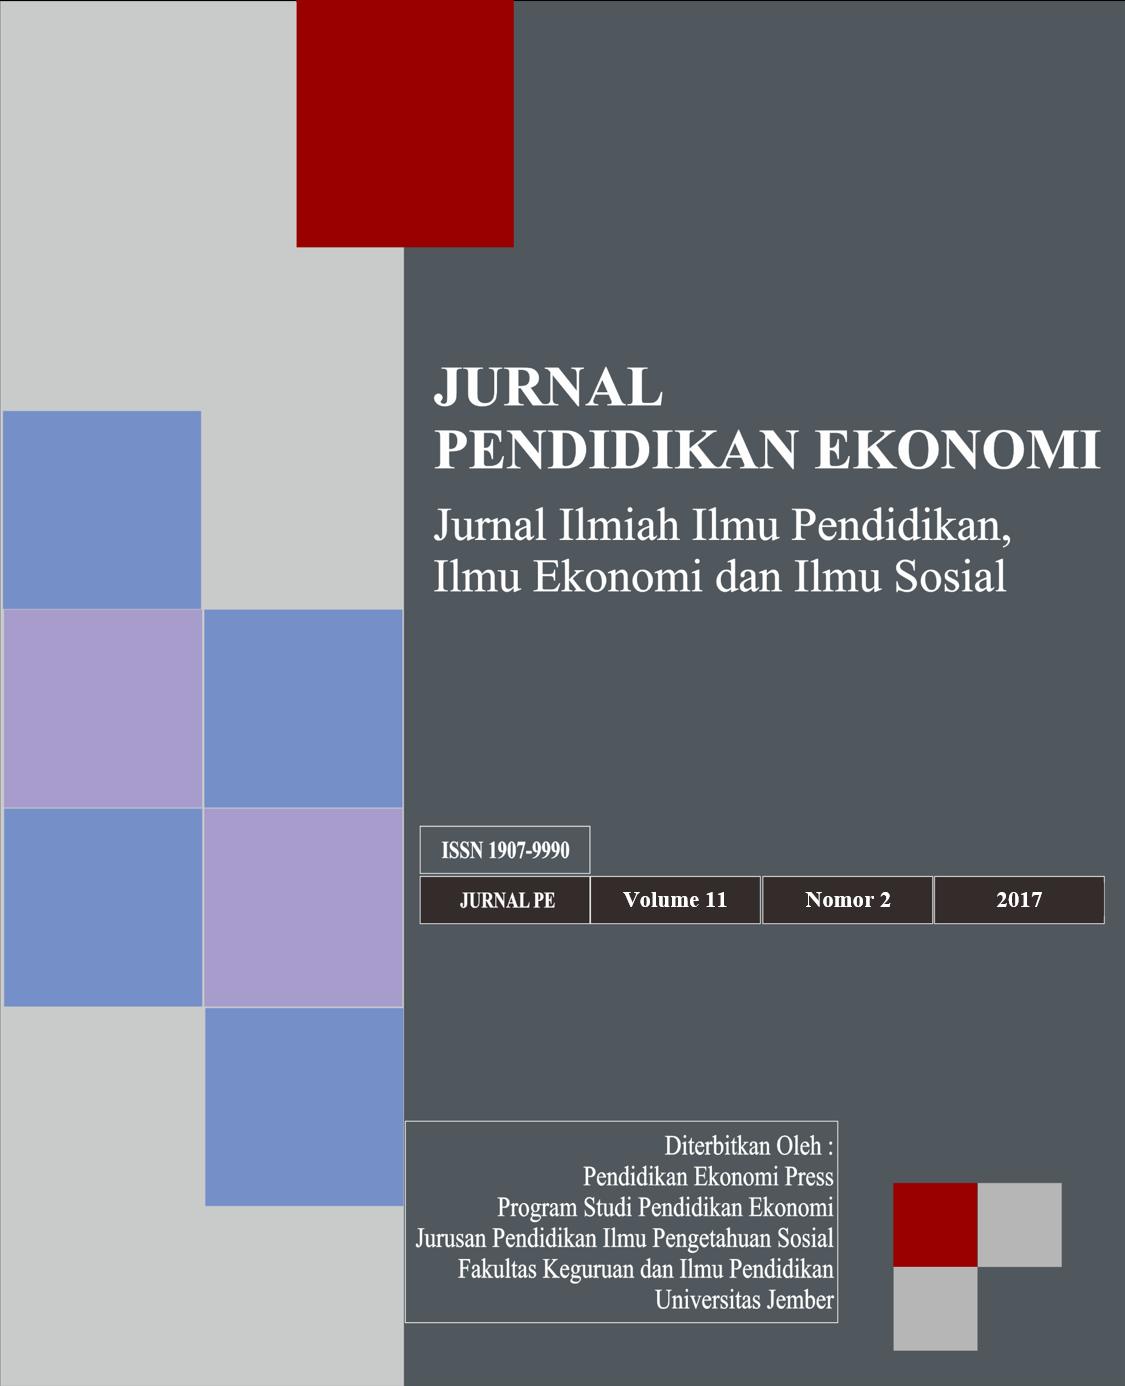 Jurnal Pendidikan Ekonomi: Jurnal Ilmiah Ilmu Pendidikan, Ilmu Ekonomi, dan Ilmu Sosial